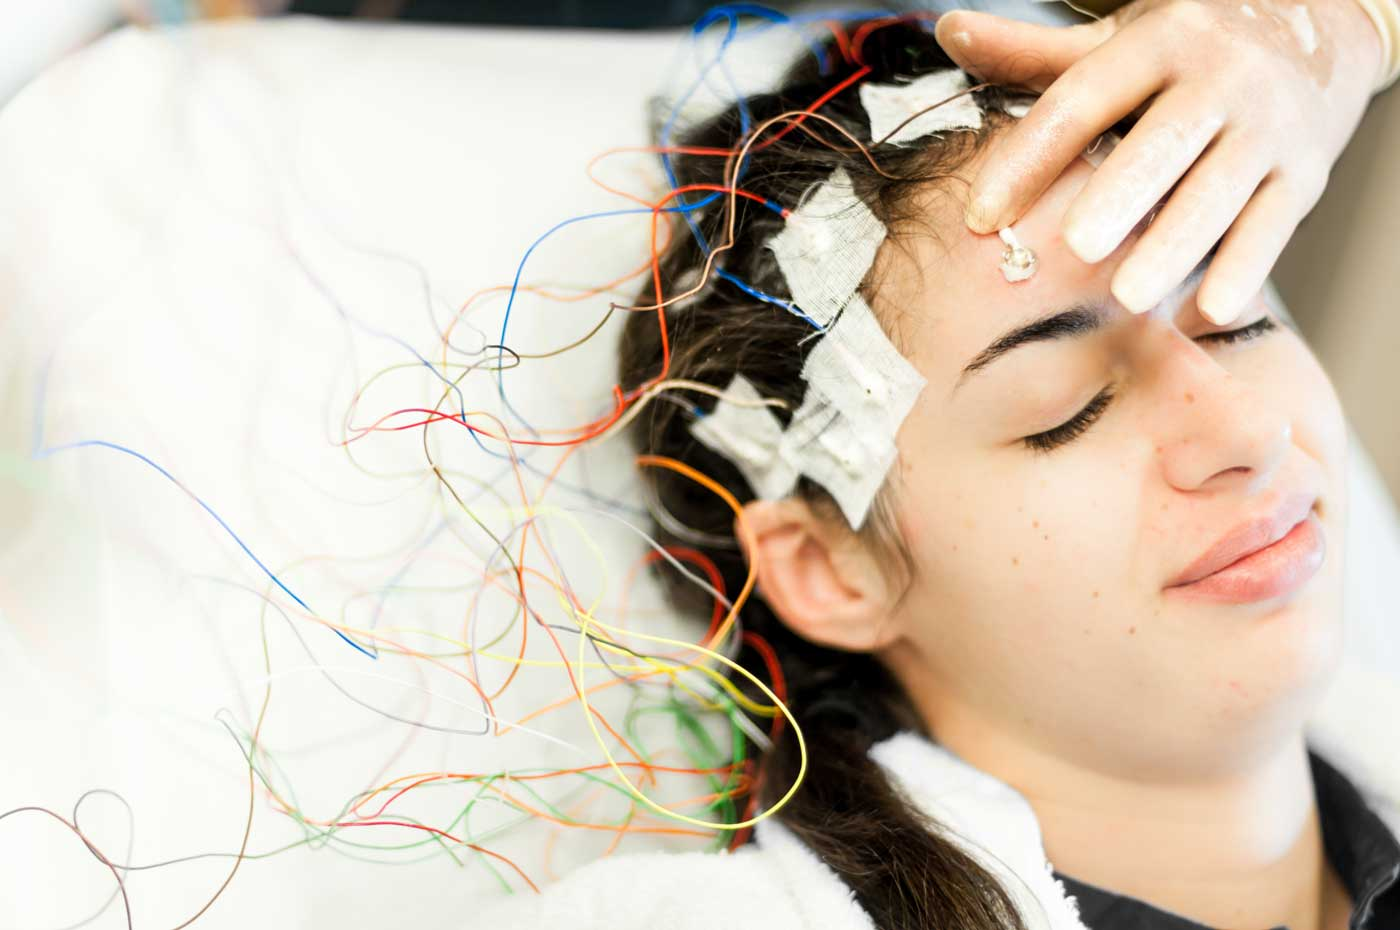 epilepsy-research2